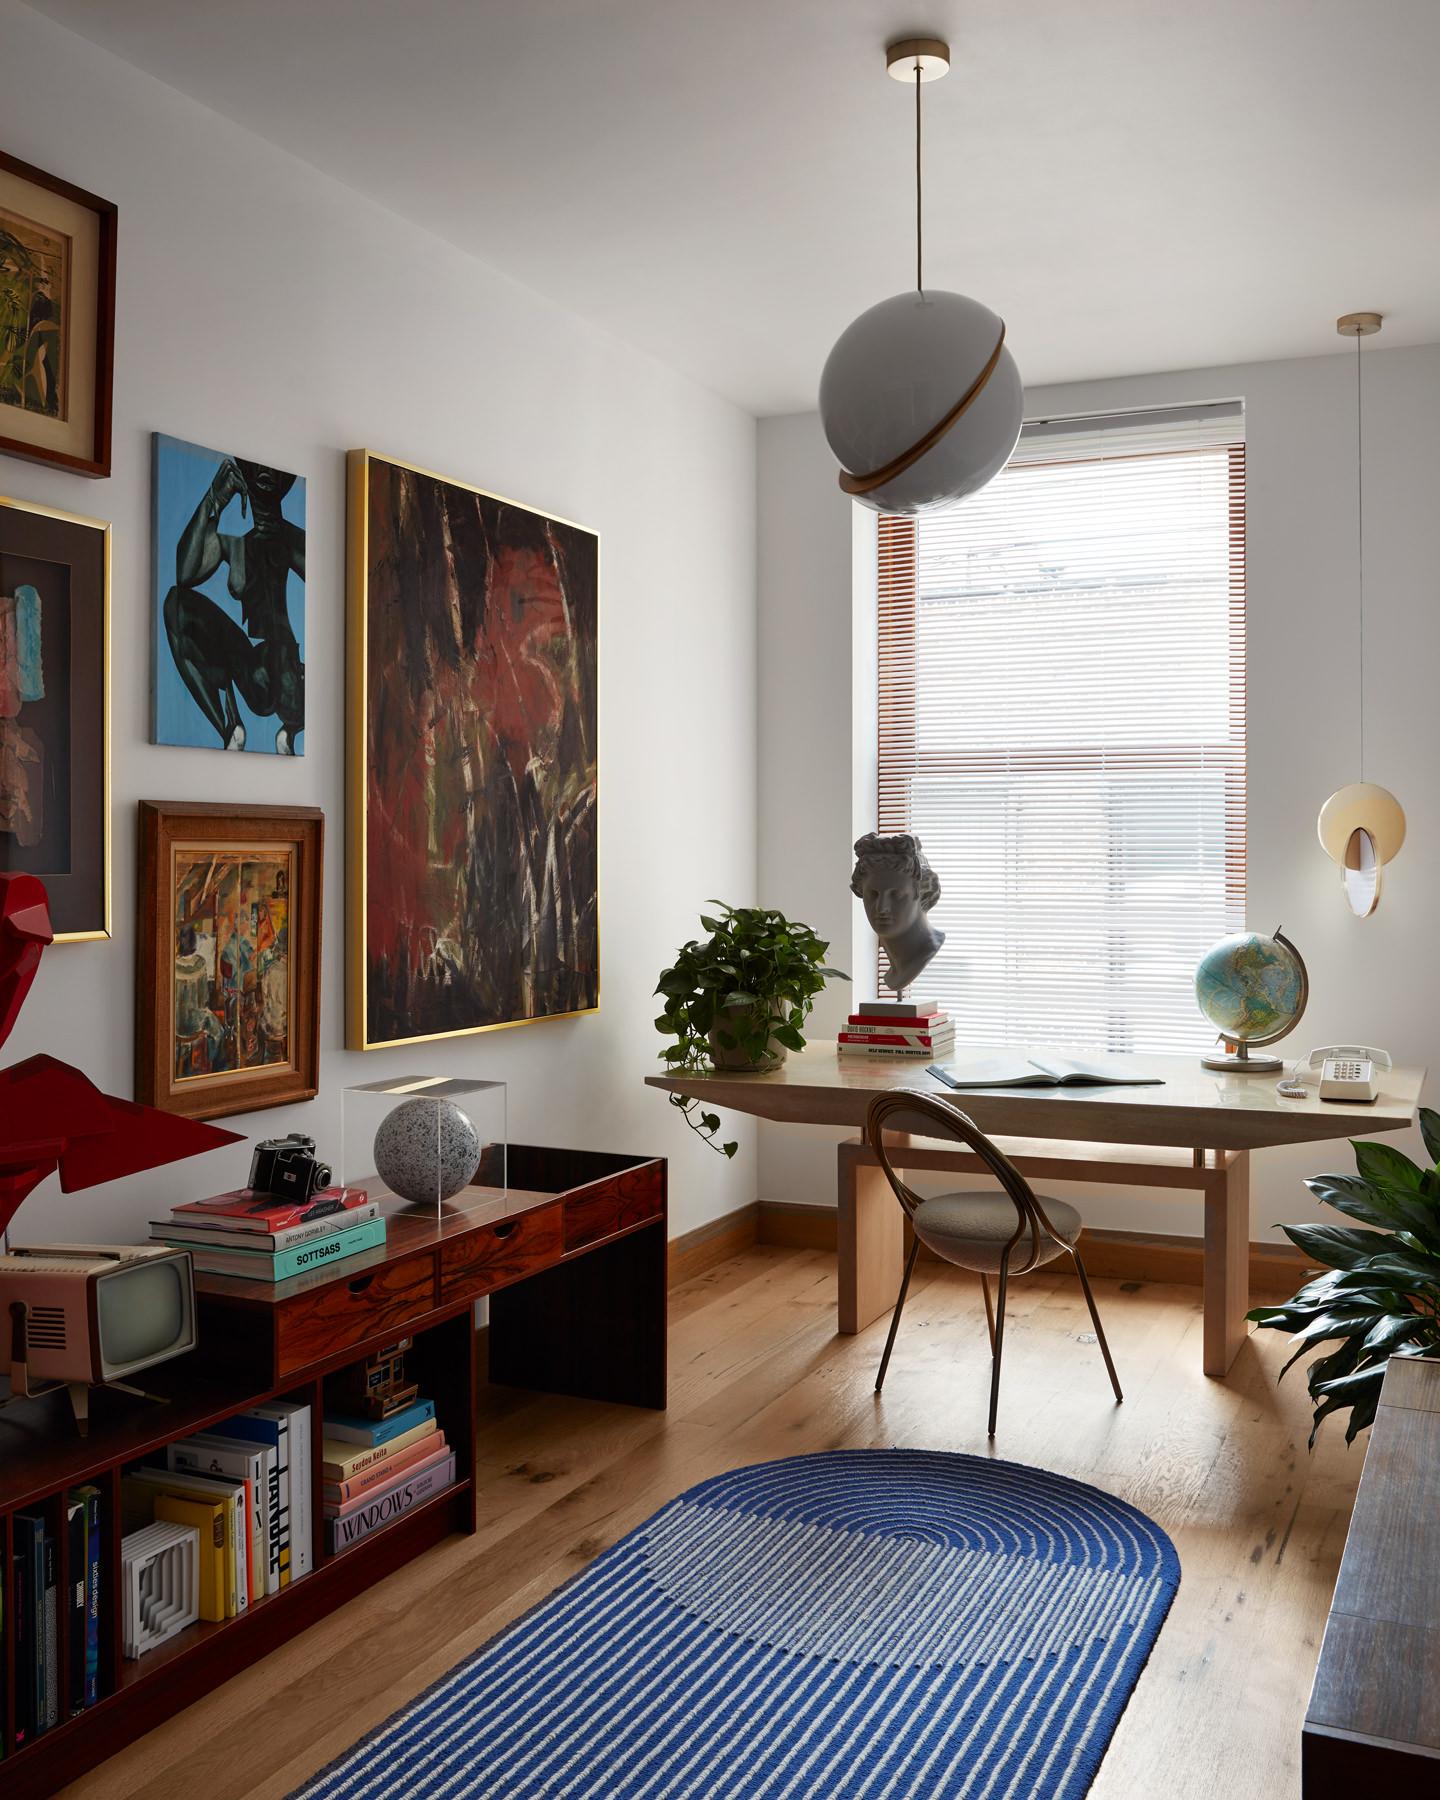 Lee Broom Penthouse New York Study Photo Stephen Kent Johnson Yellowtrace 08